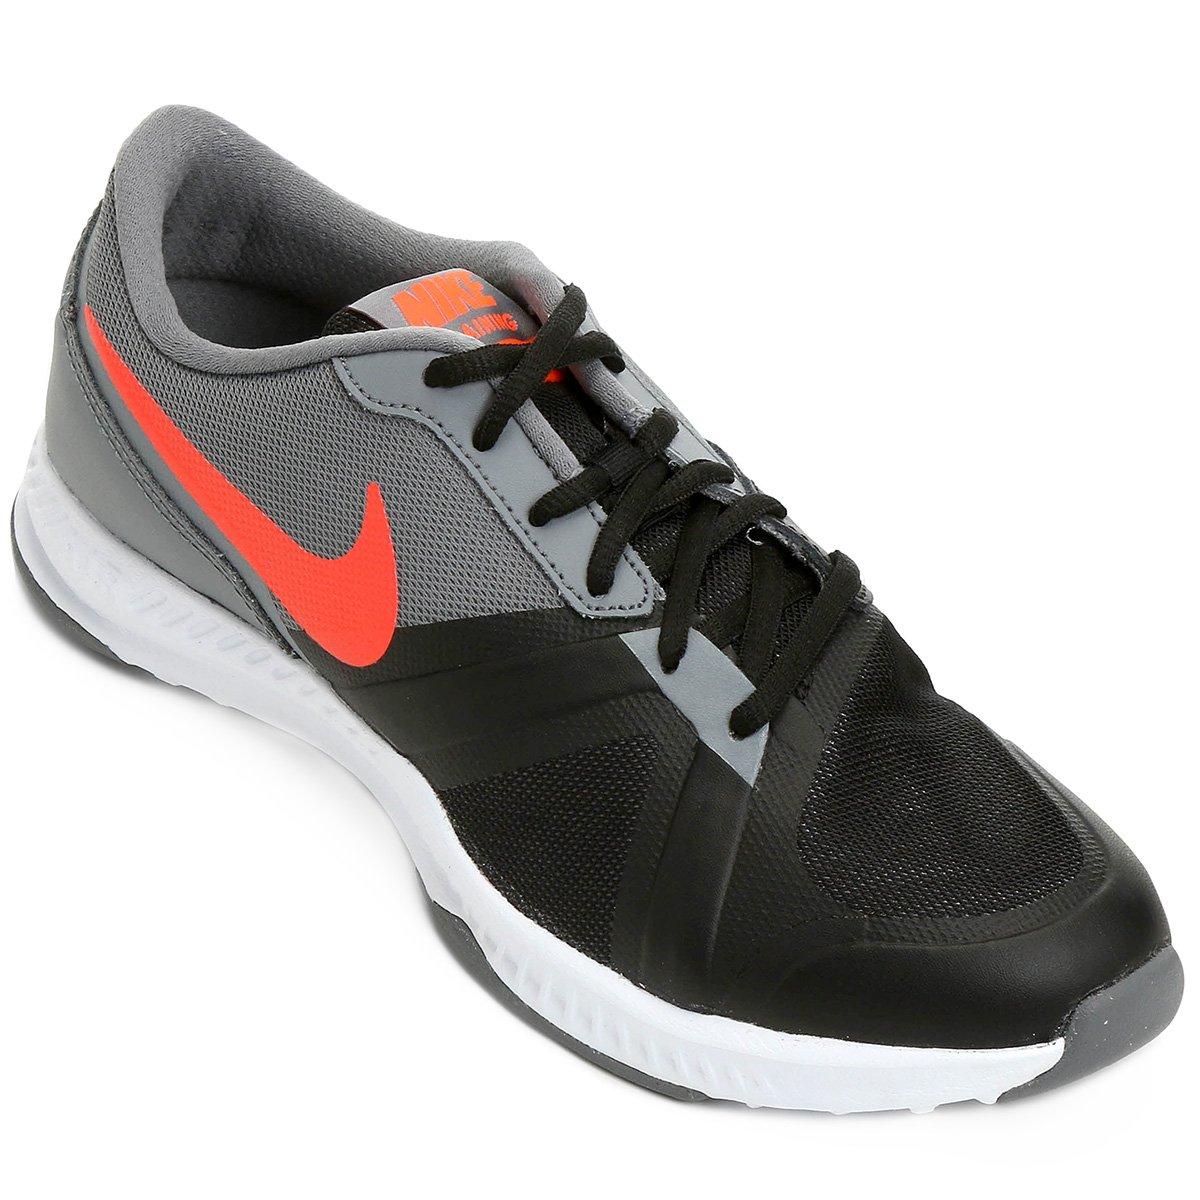 4e24b0860b5 Tênis Nike Air Epic Speed Training Masculino - Compre Agora